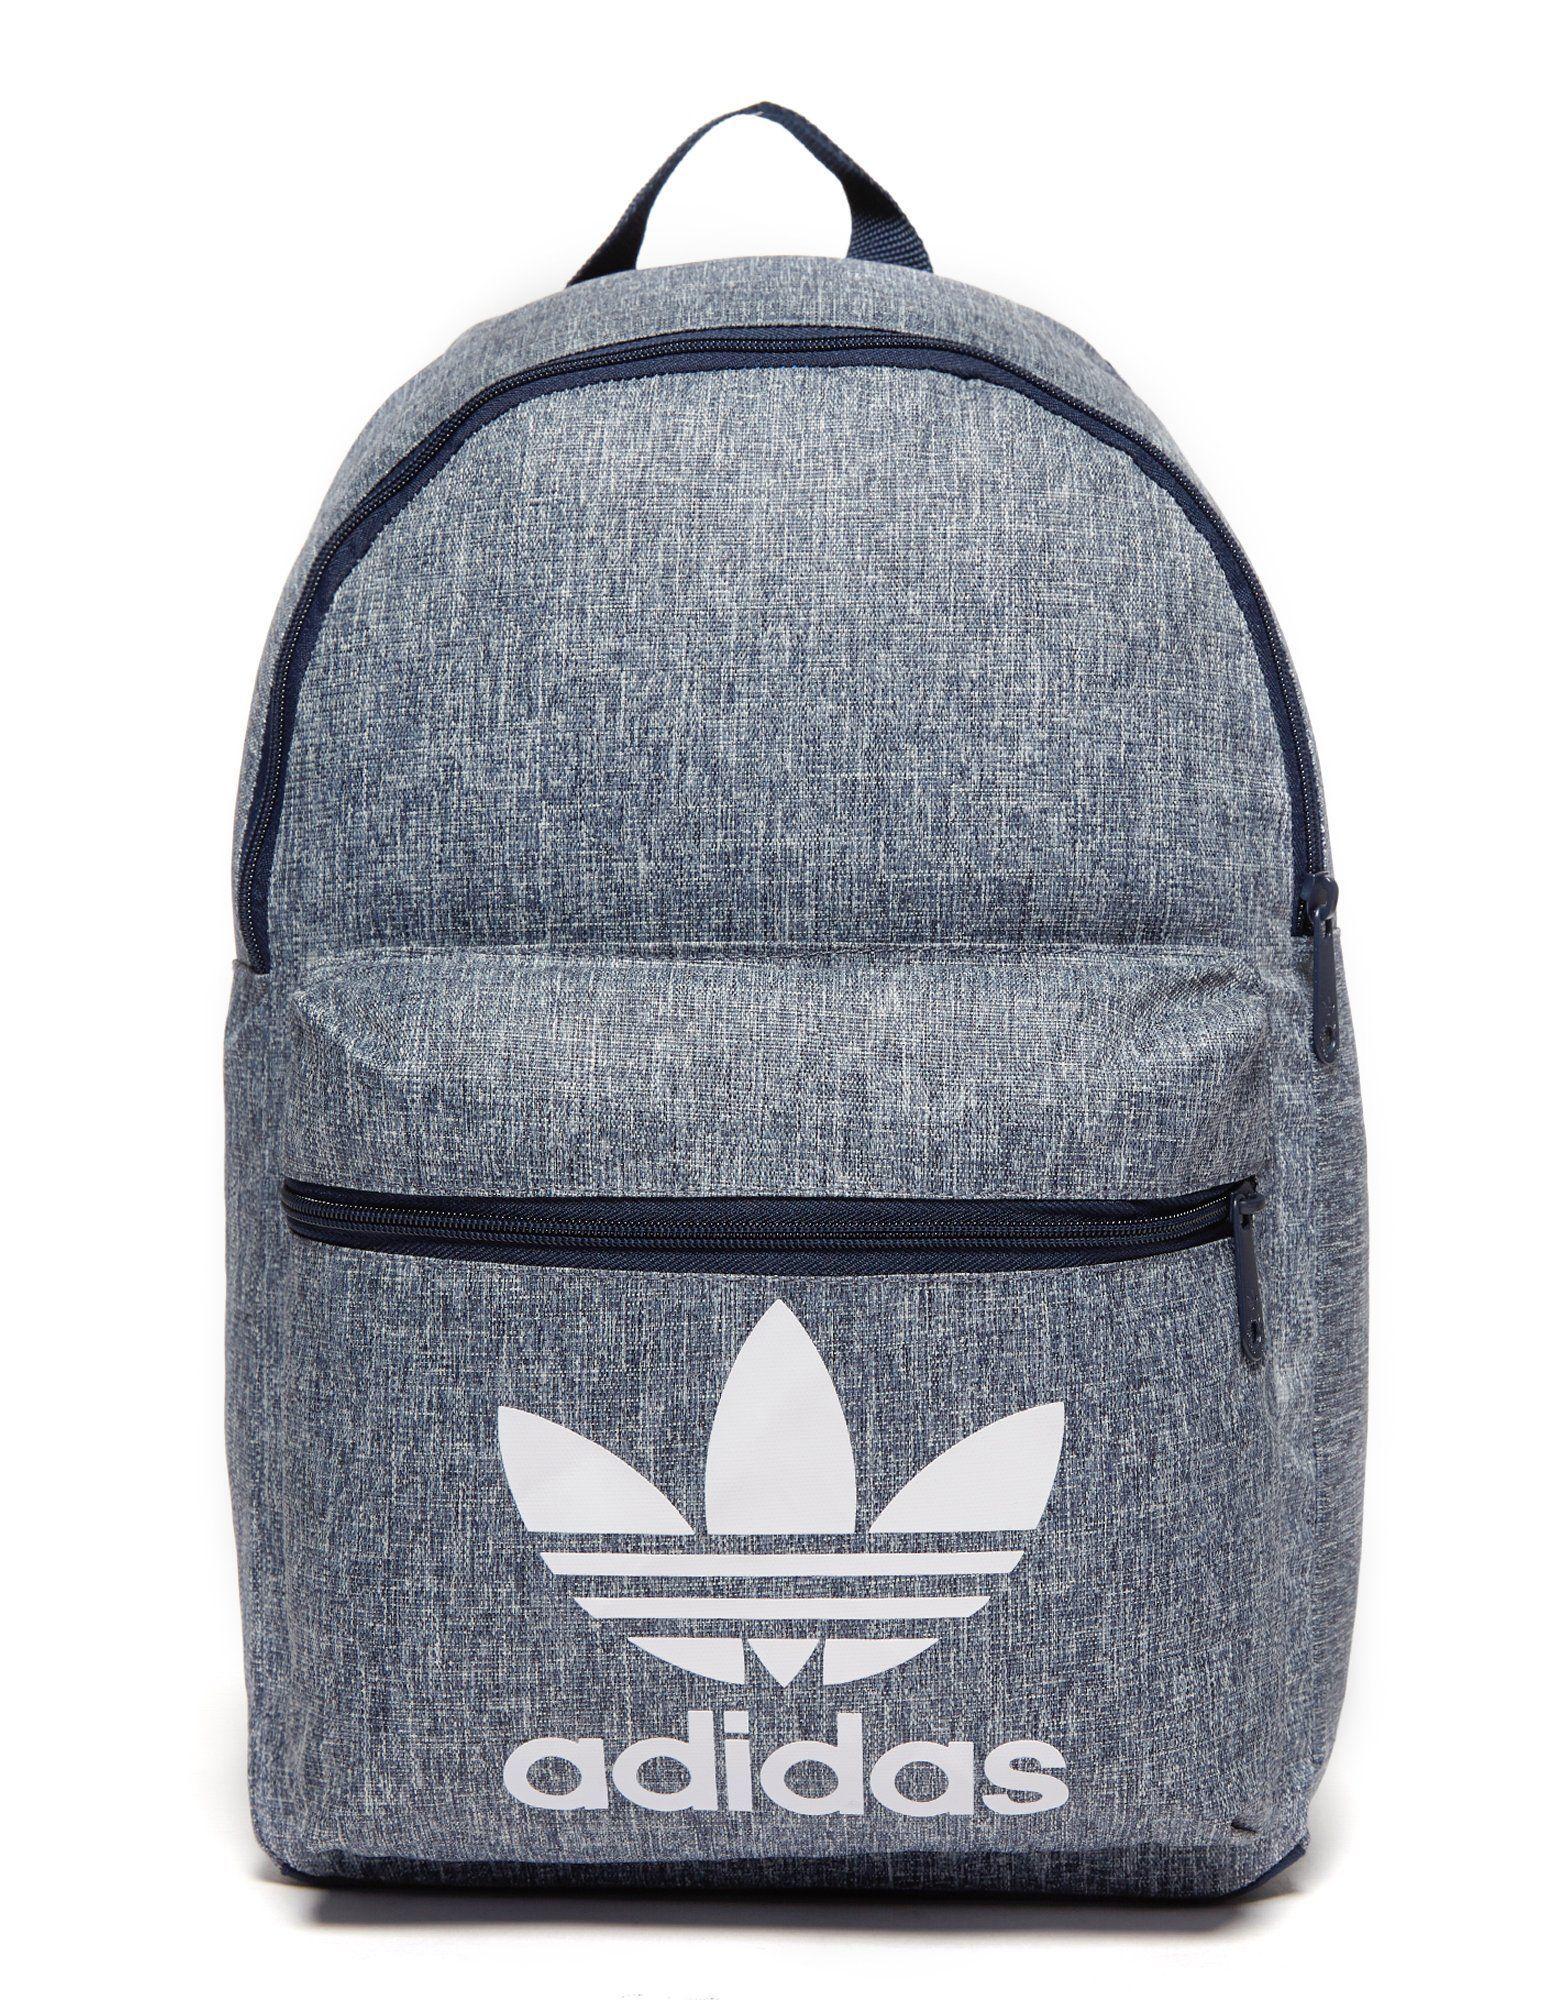 adidas bags - Google Search Adidas Bags, Adidas Men, Backpack Bags, Rucksack  Bag 051cda239e